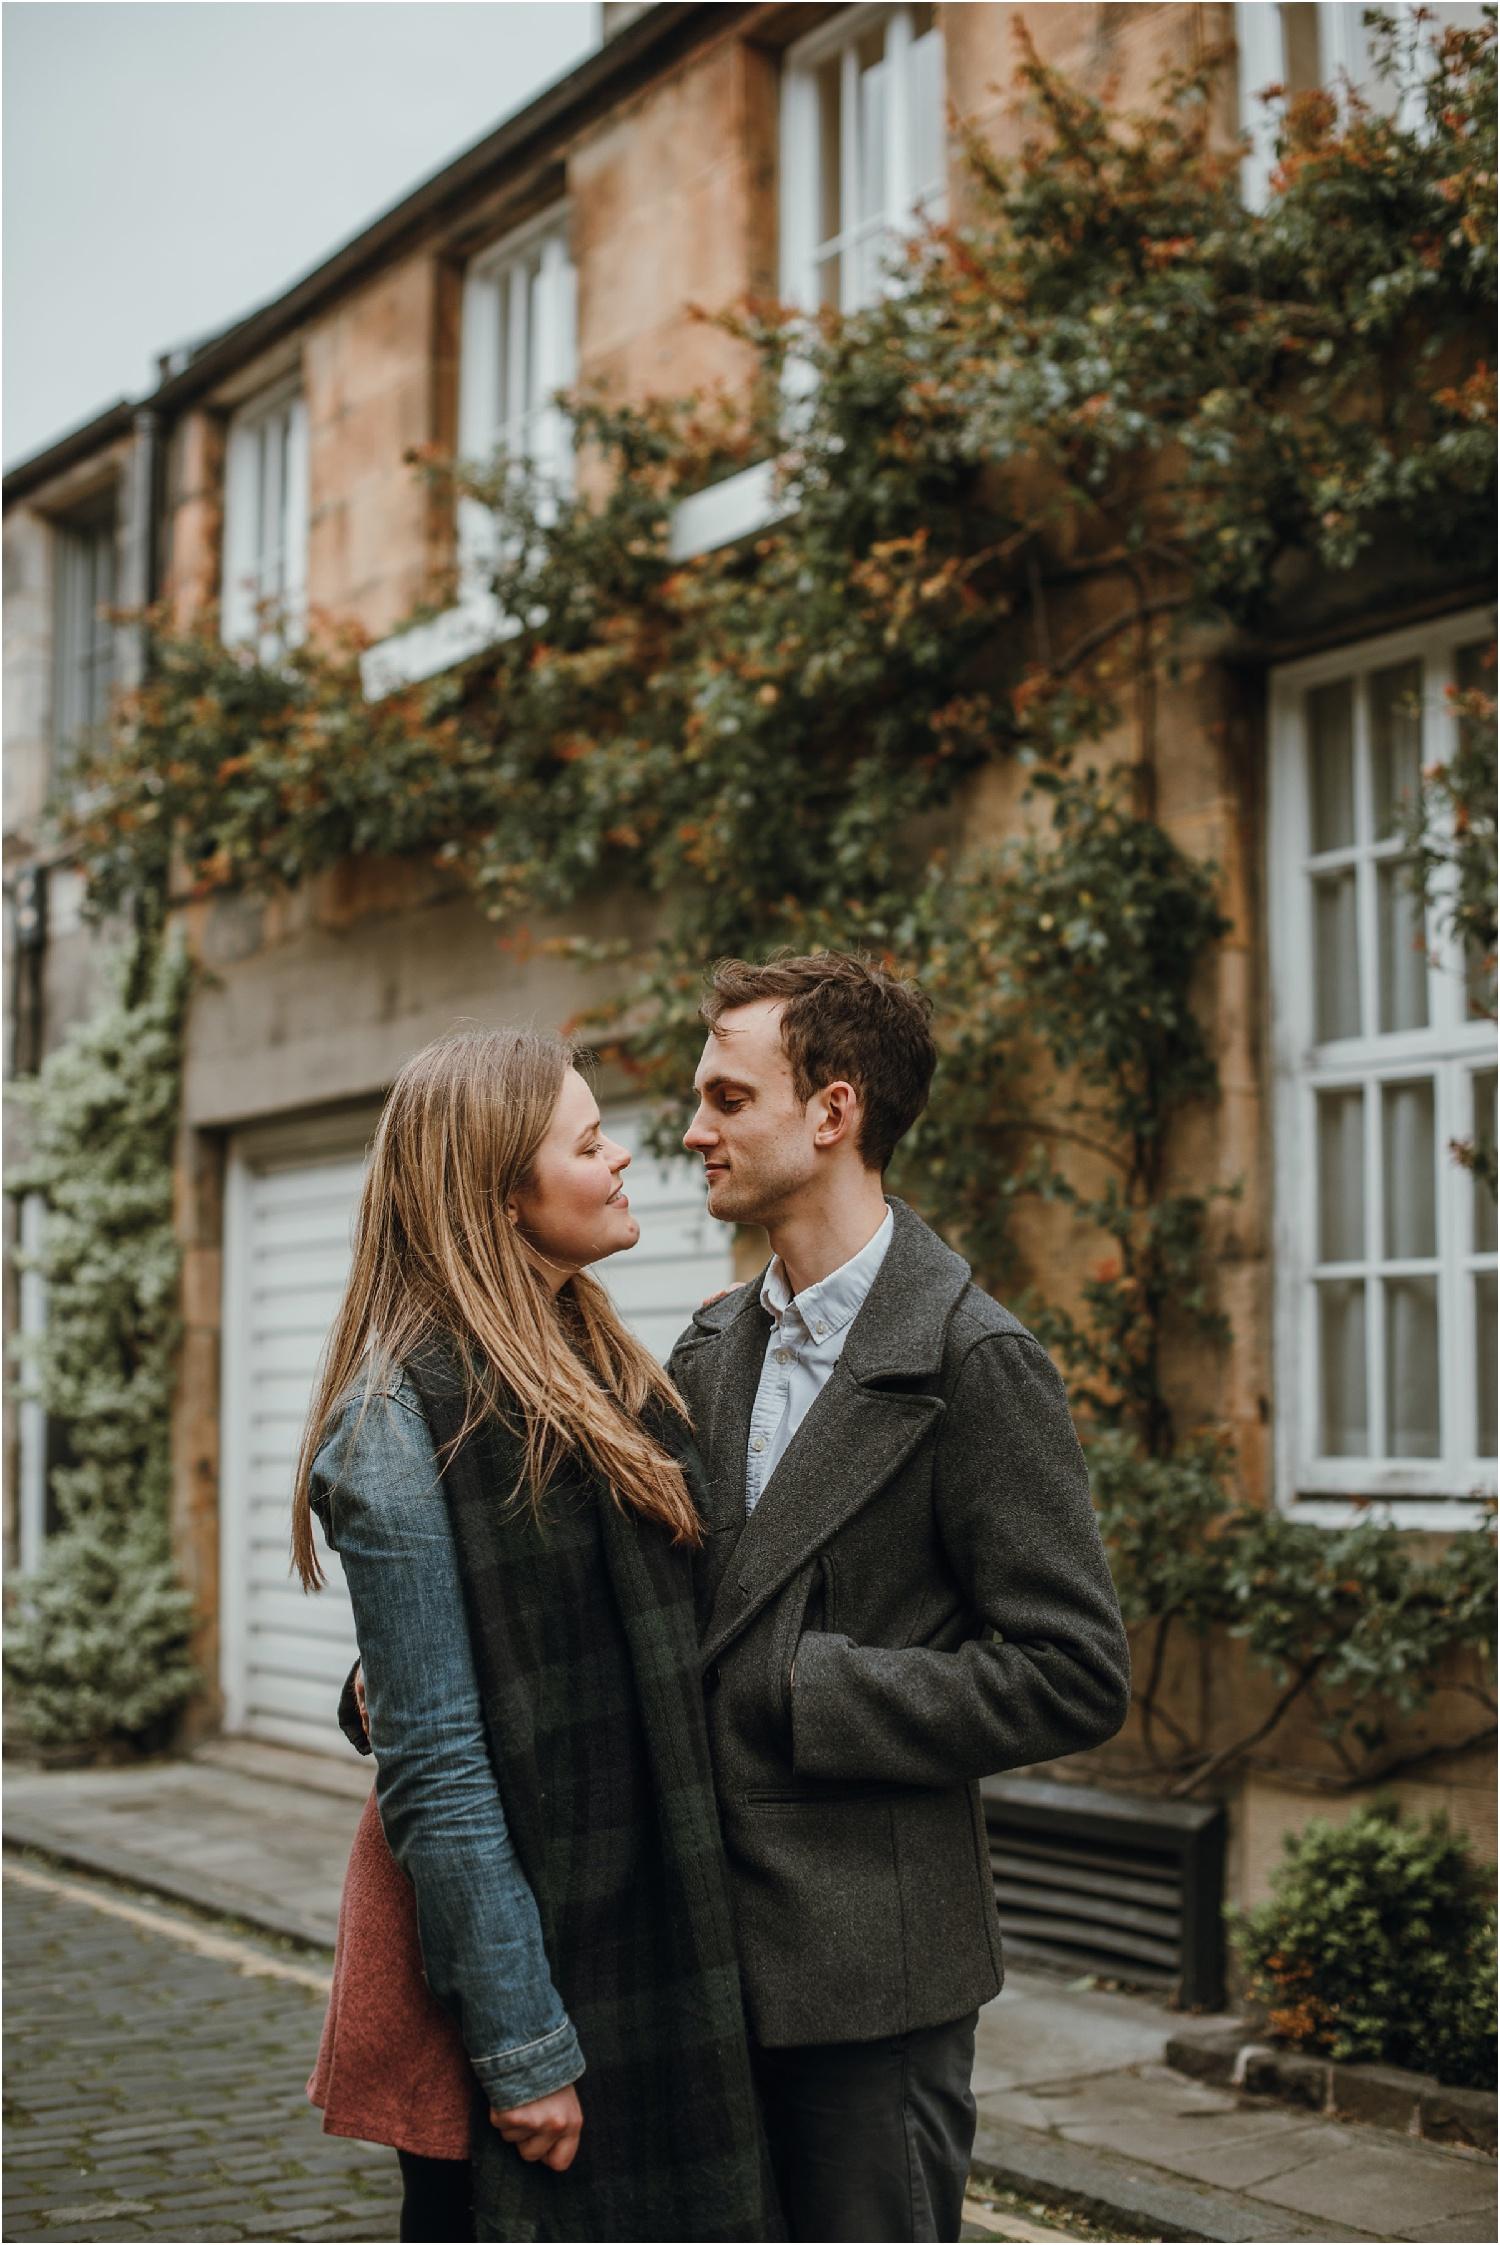 Edinburgh-Engagement-Photographer-TimEmily_0020.jpg